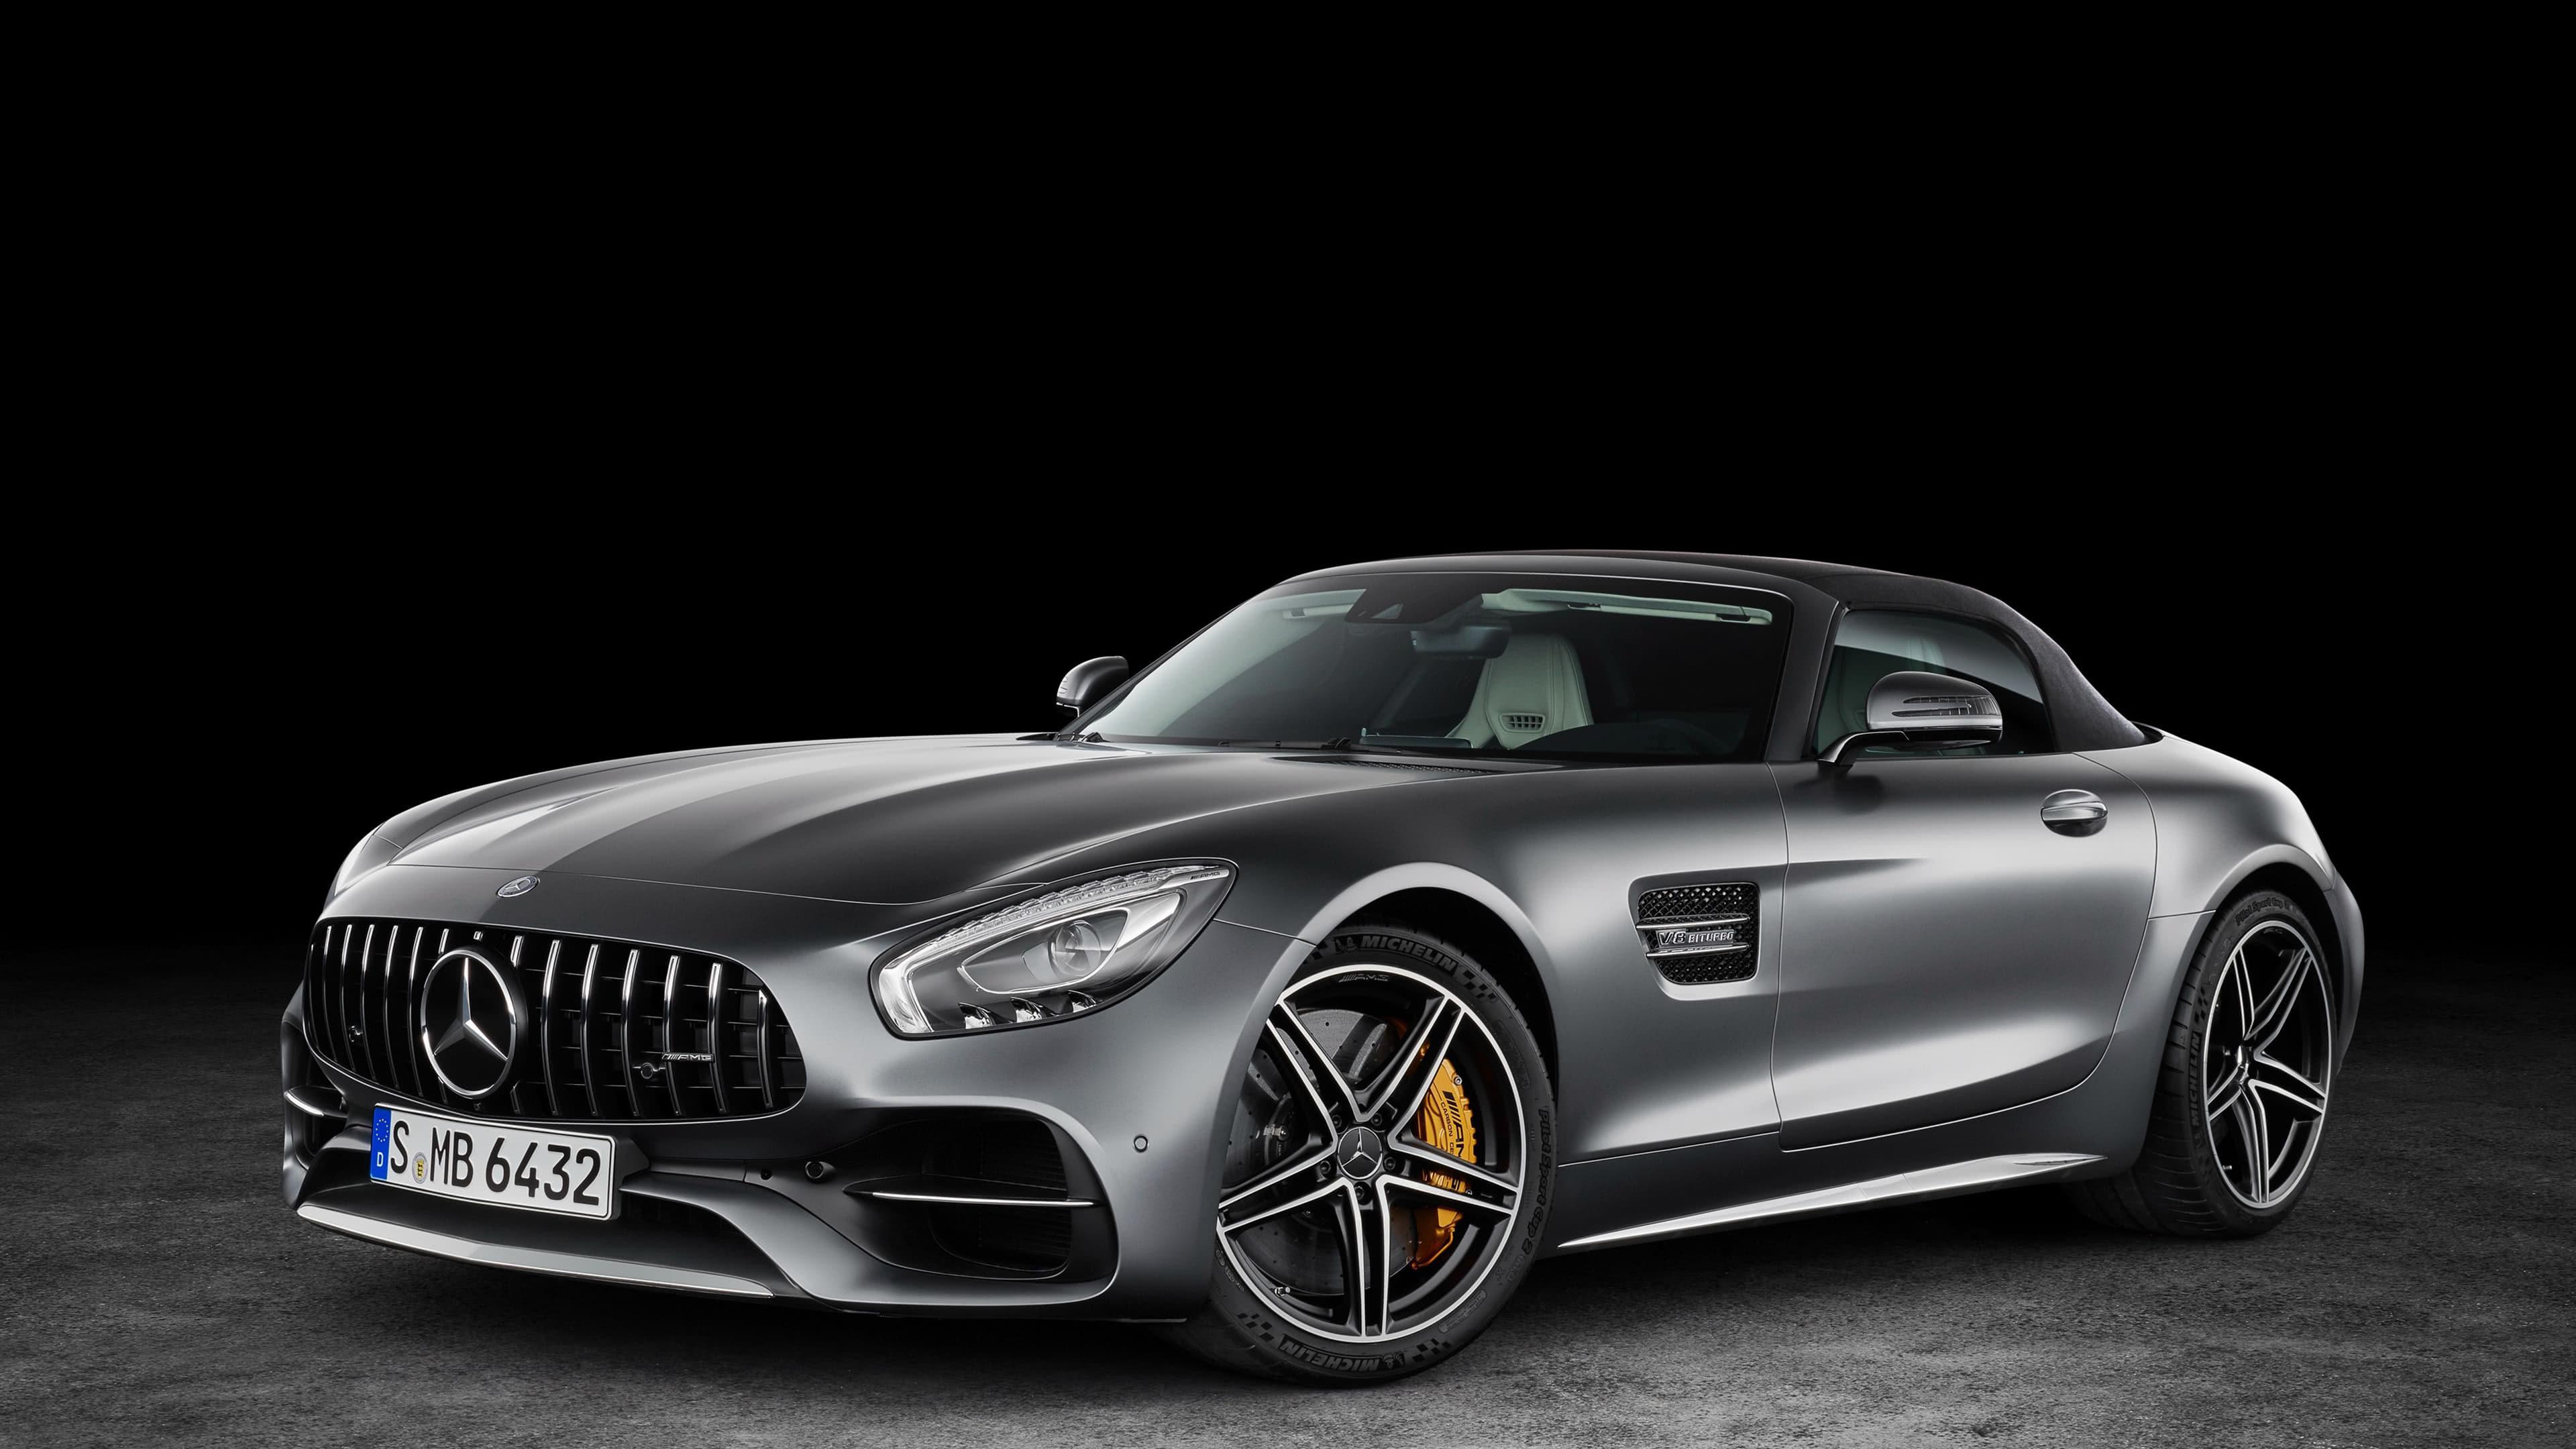 Mercedes Amg Gt Roadster Uhd 4k Wallpaper 3840x2160 Wallpaper Teahub Io